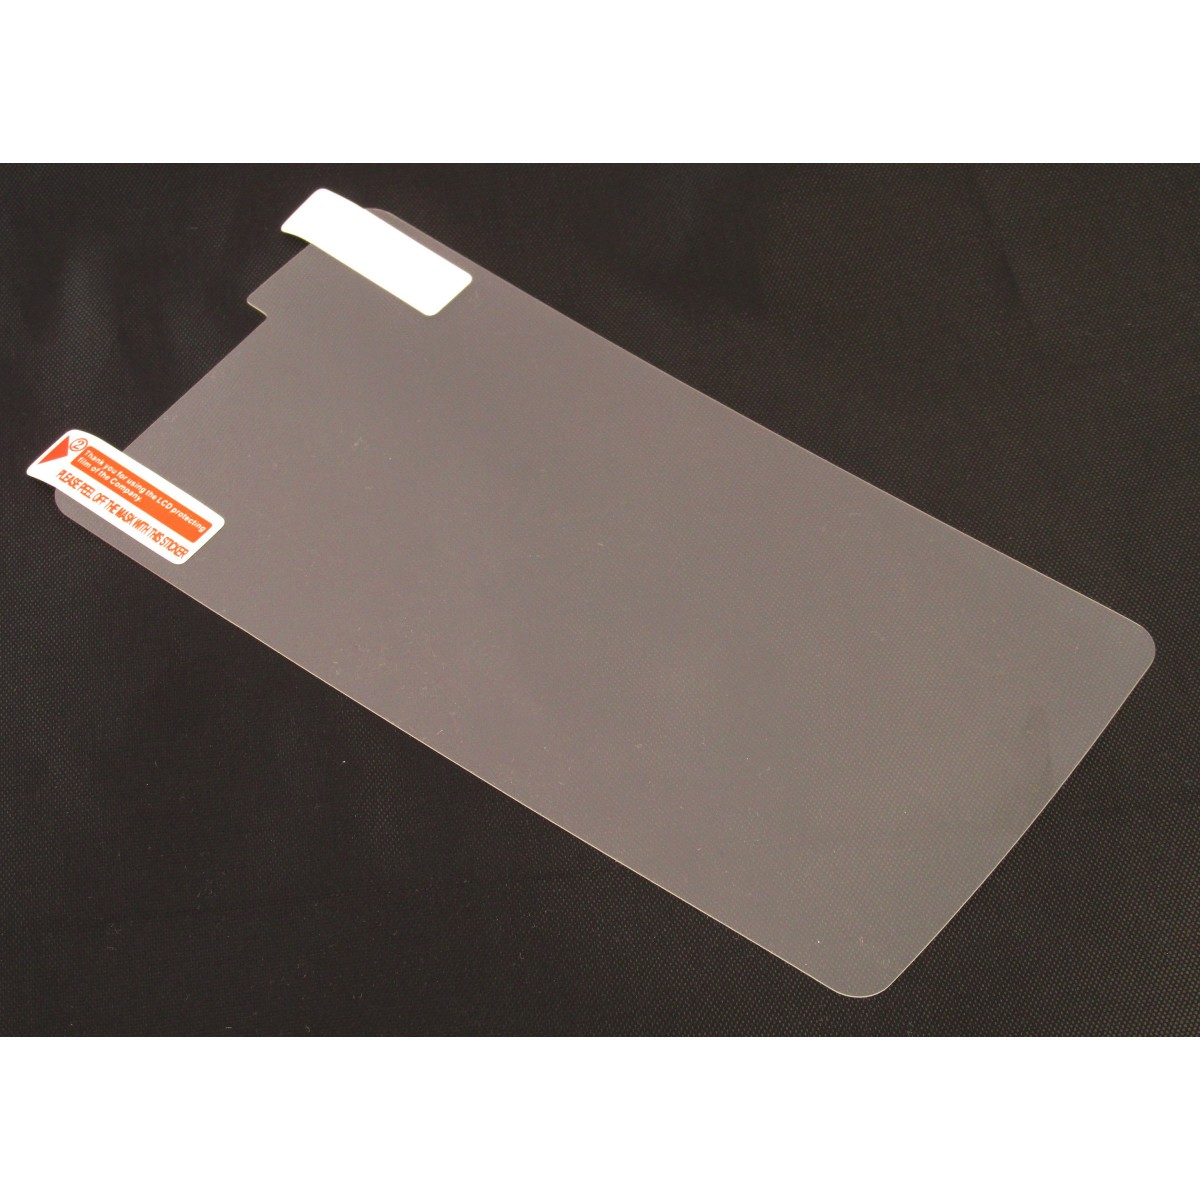 Película Protetora para LG G3 D850 - Fosca